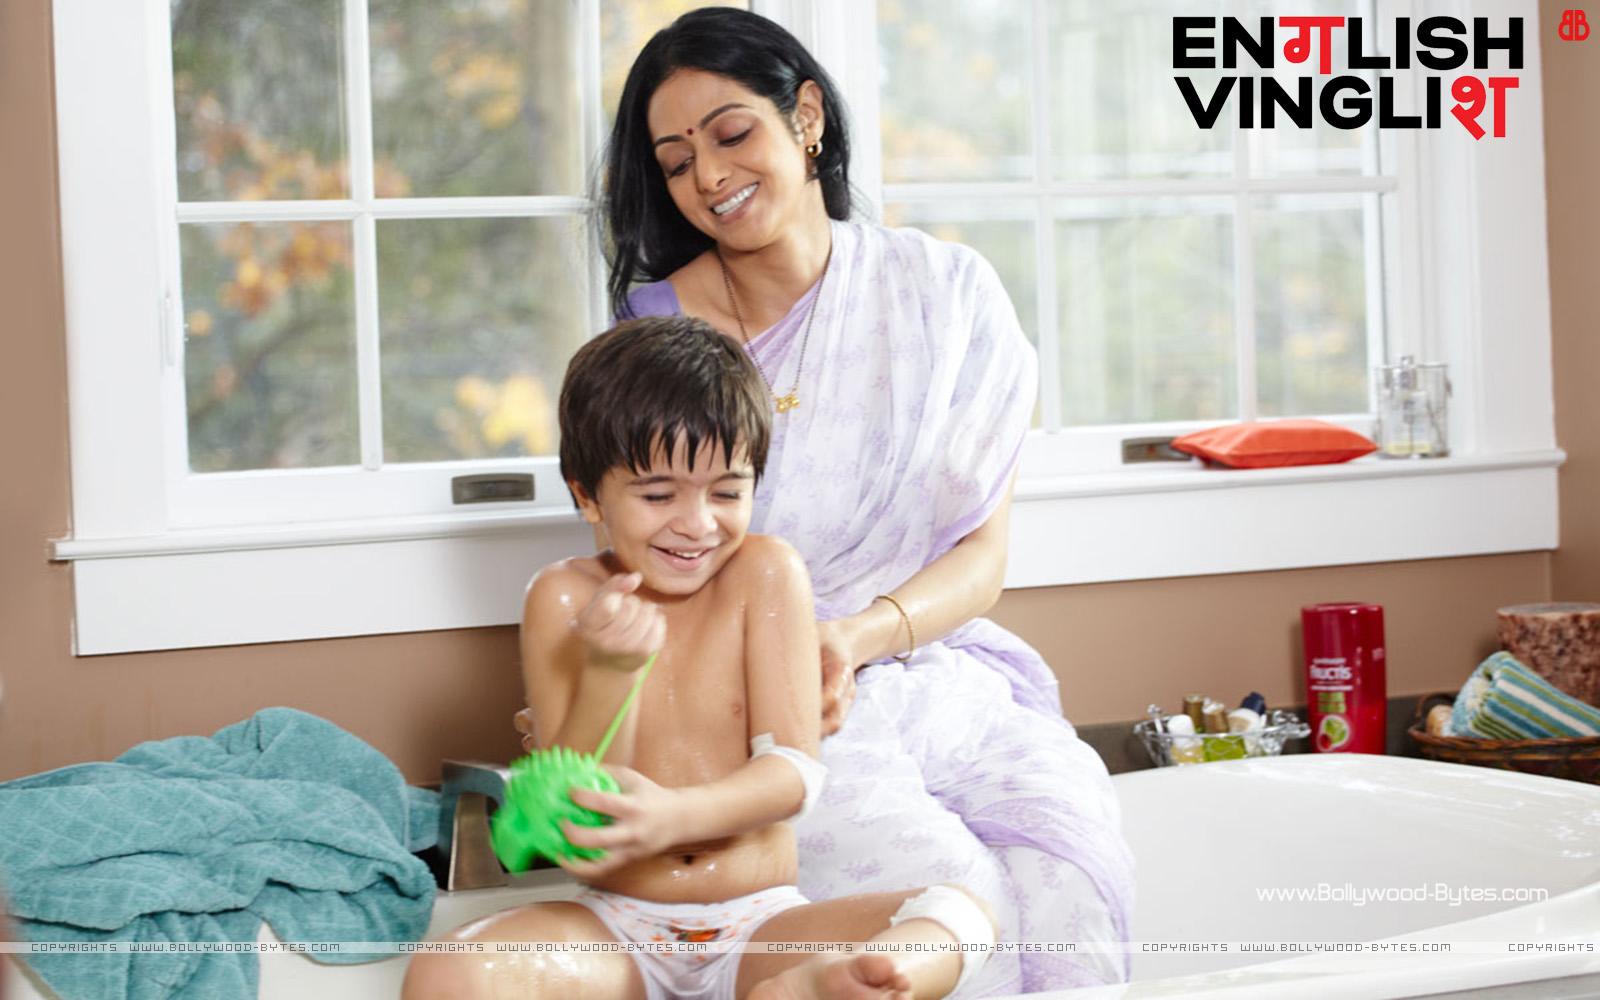 Sayali Bhagat Movies List - Bollywood News